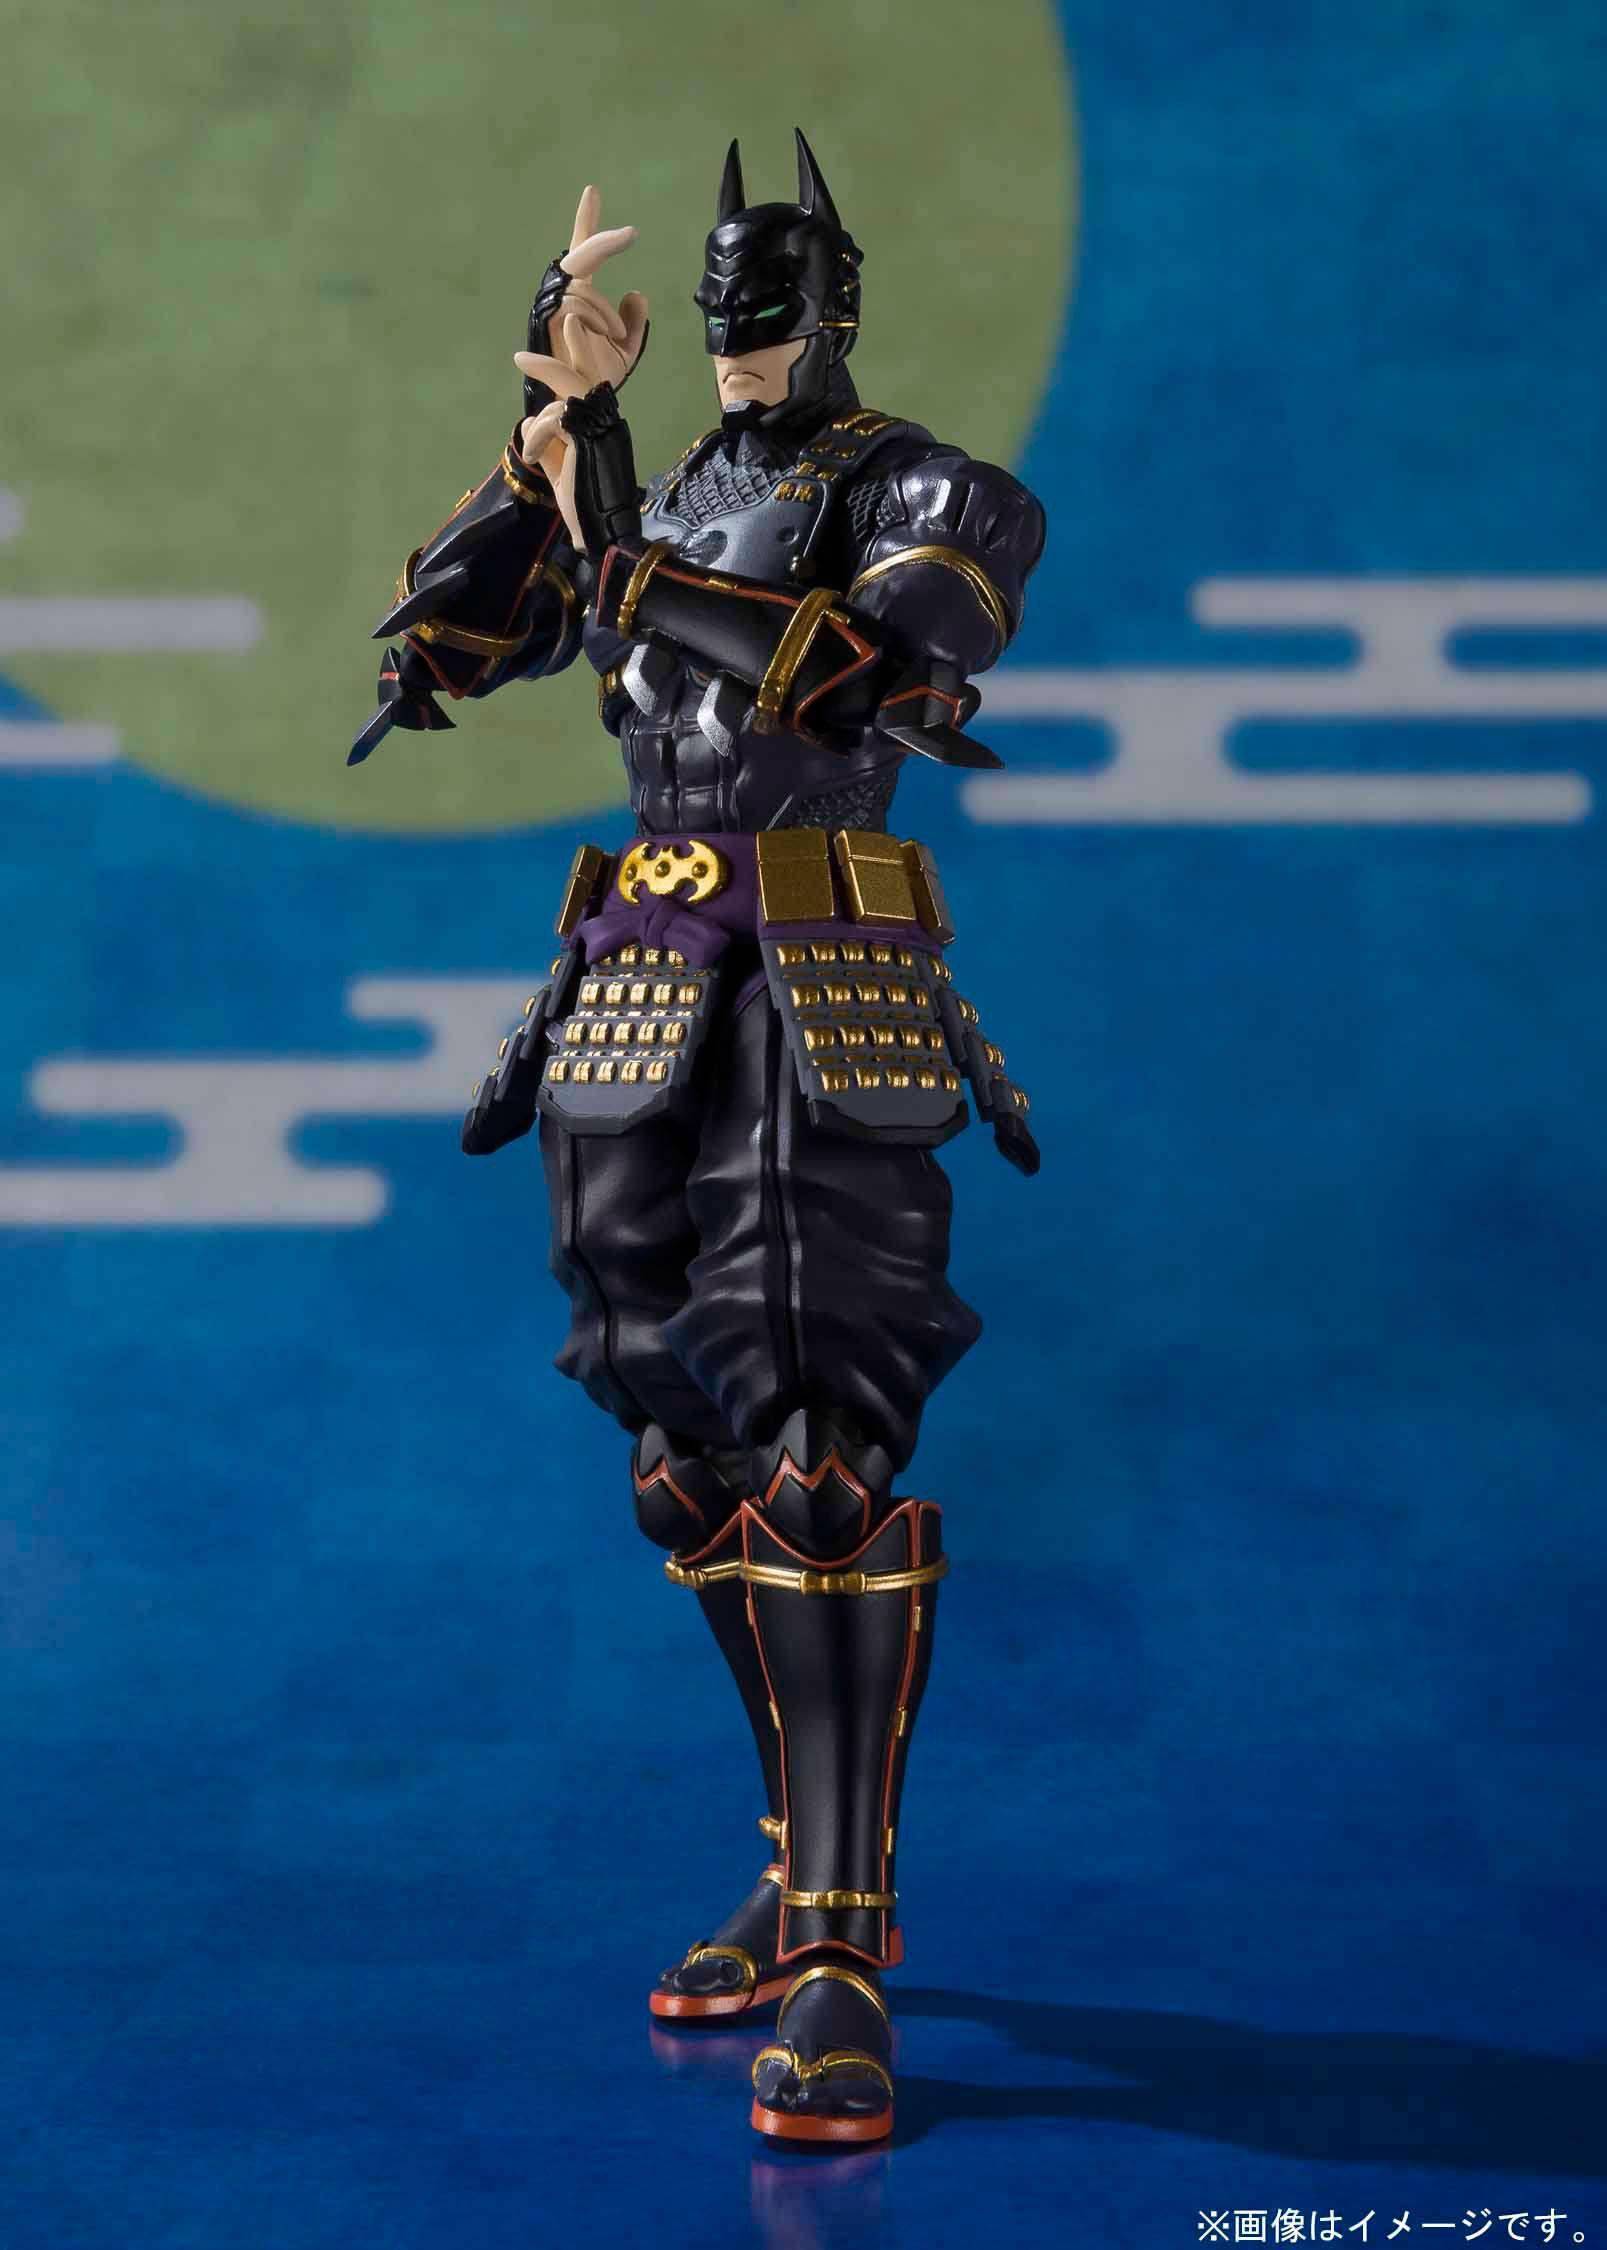 Batman Ninja S.H. Figuarts Action Figure Ninja Batman 16 cm - Animegami Store